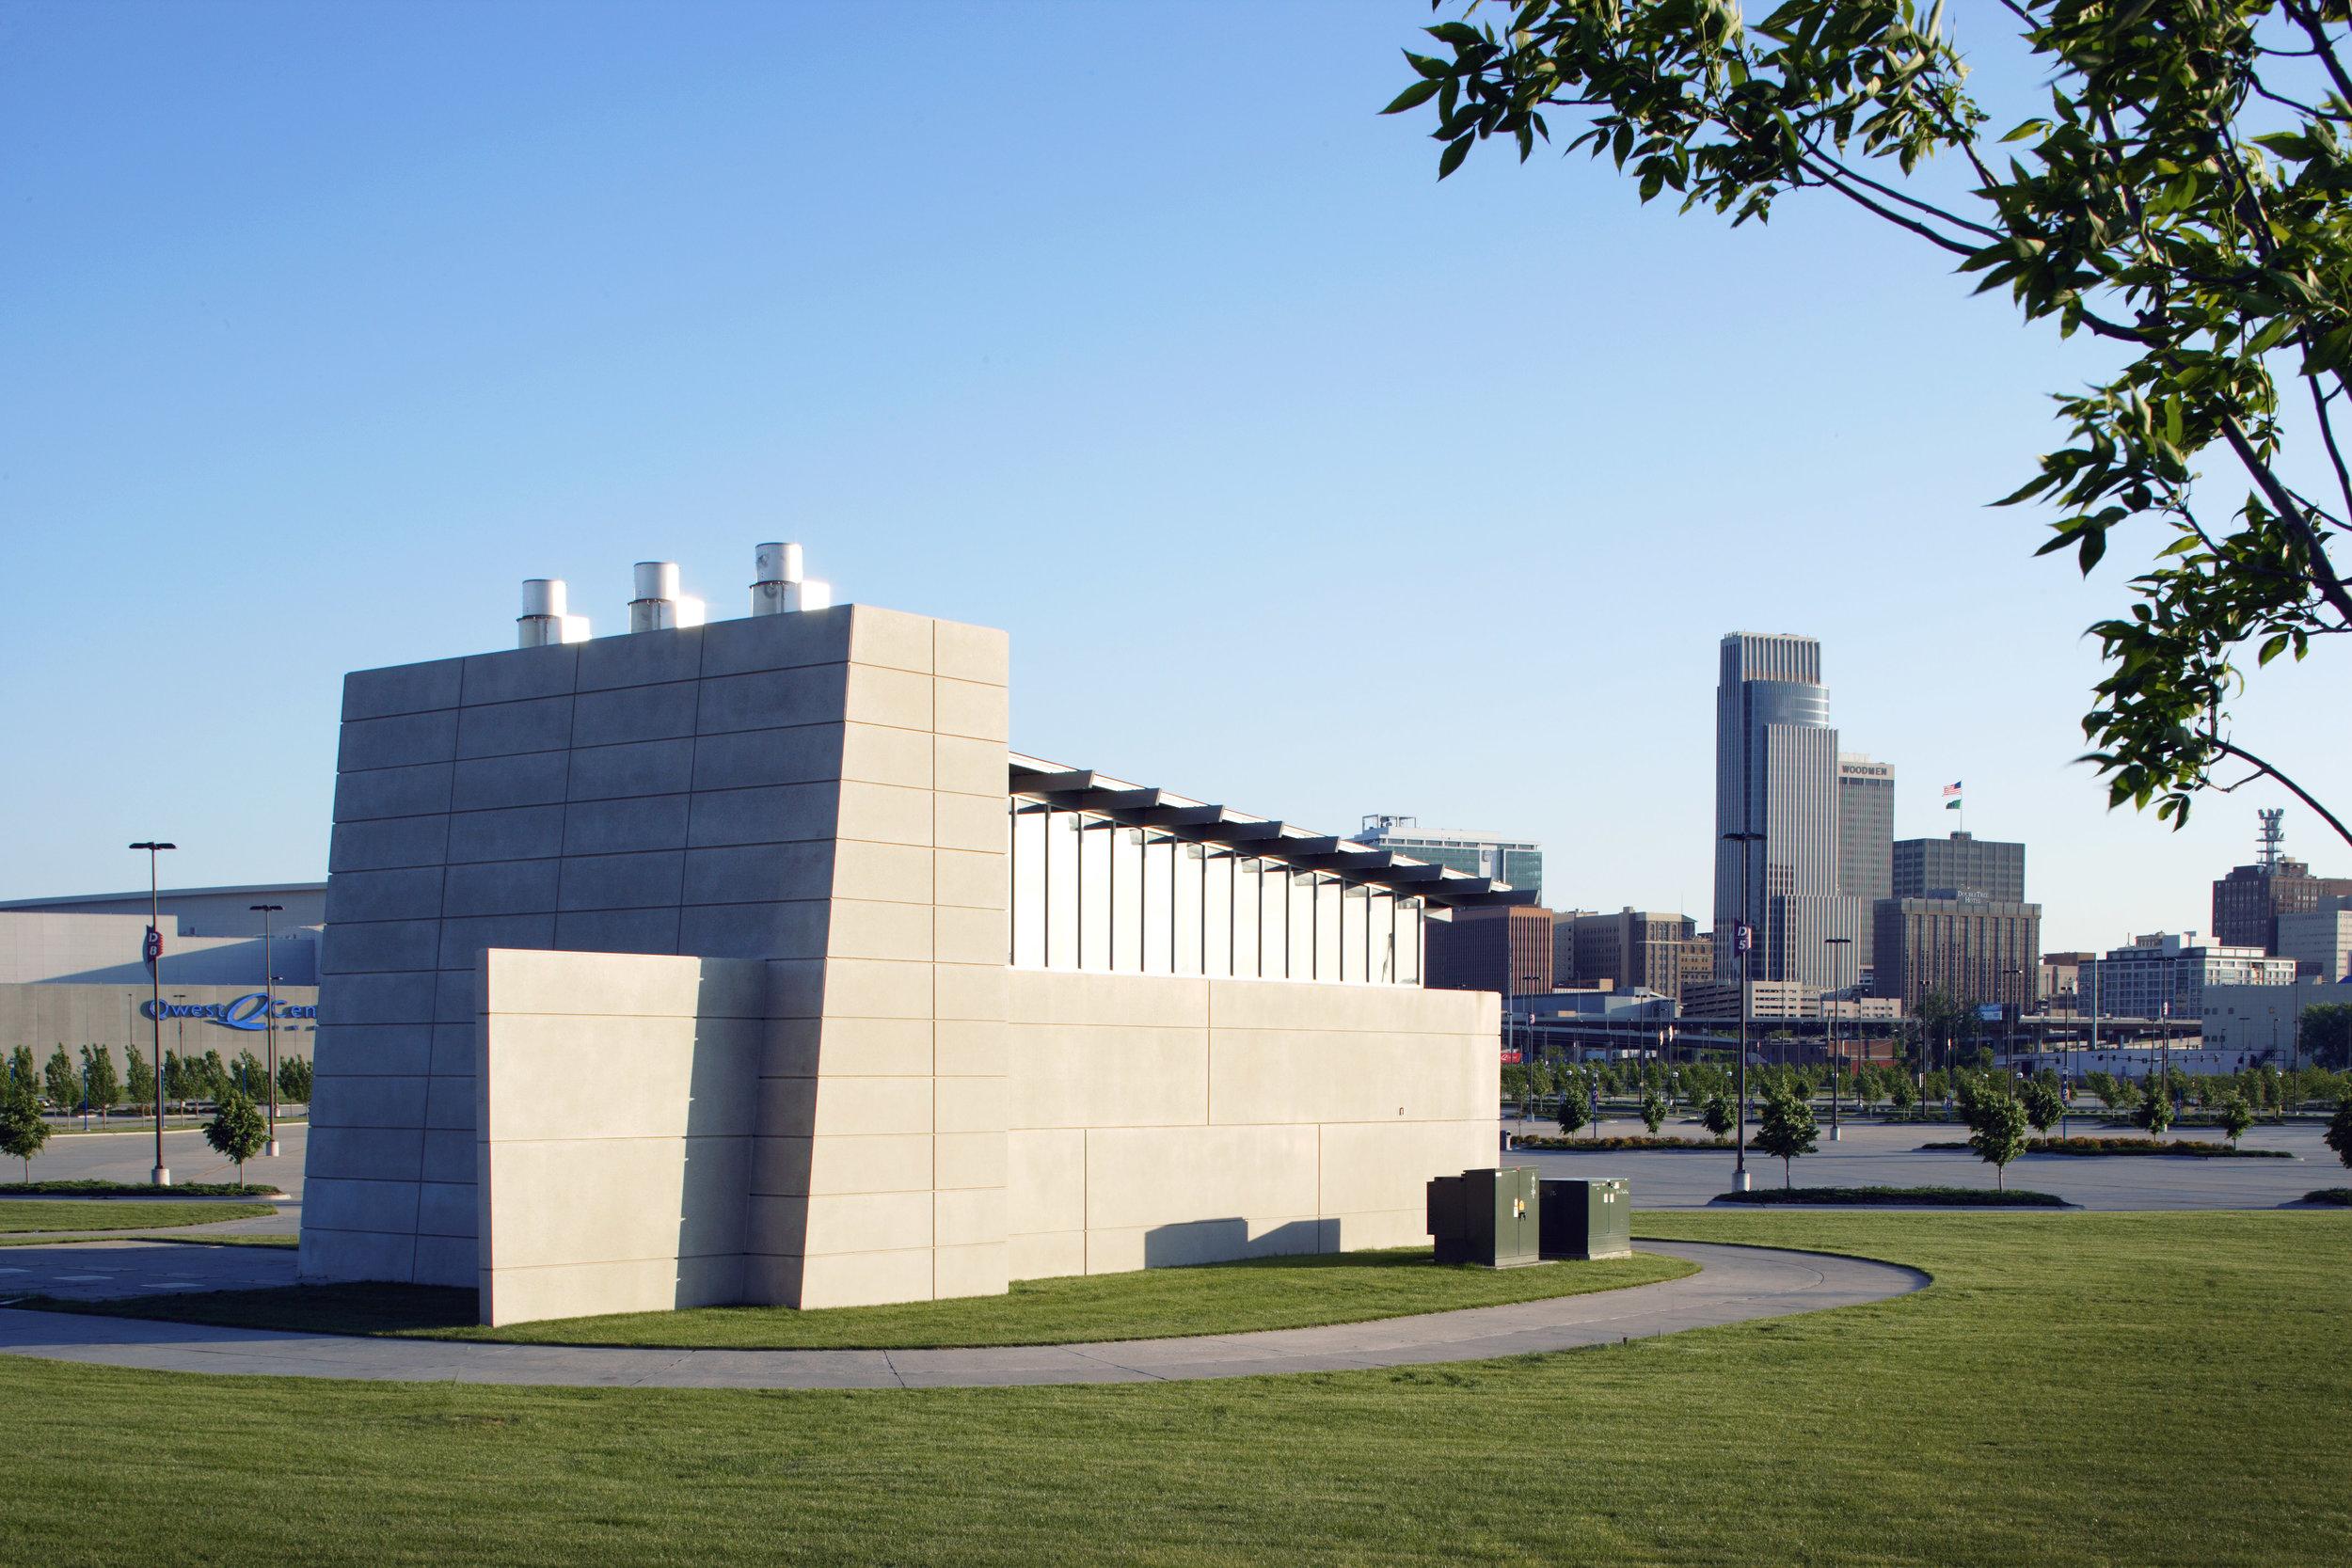 Nicholas Street Waste Removal Facility  Omaha, NE   View Gallery »